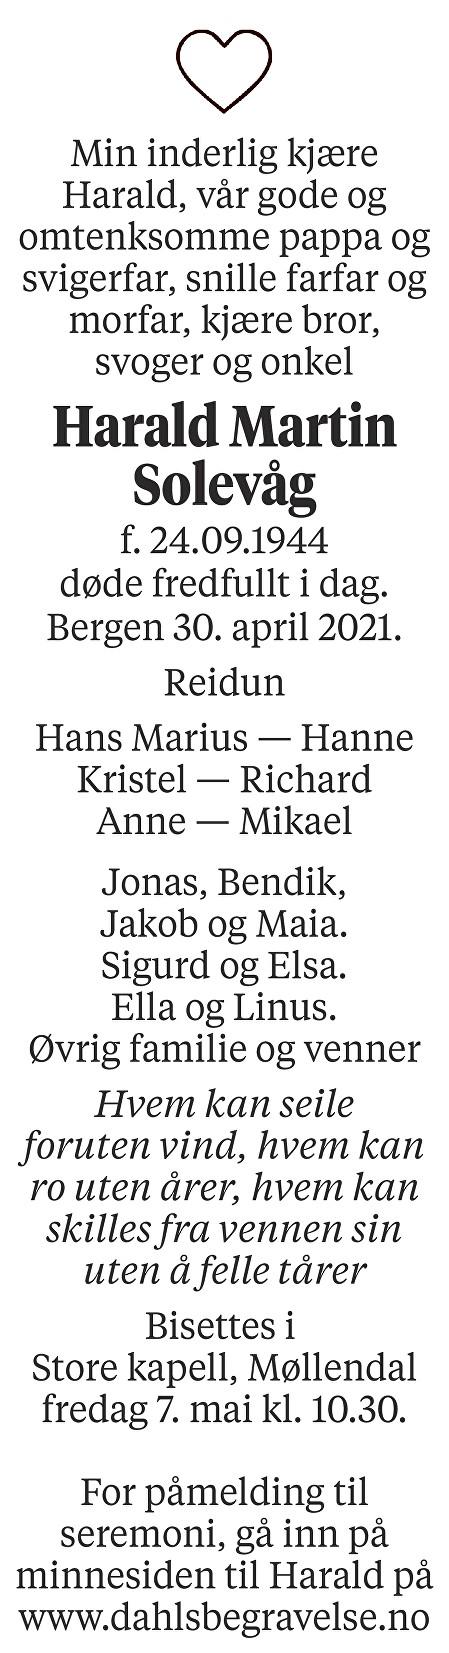 Harald Martin Solevåg Dødsannonse